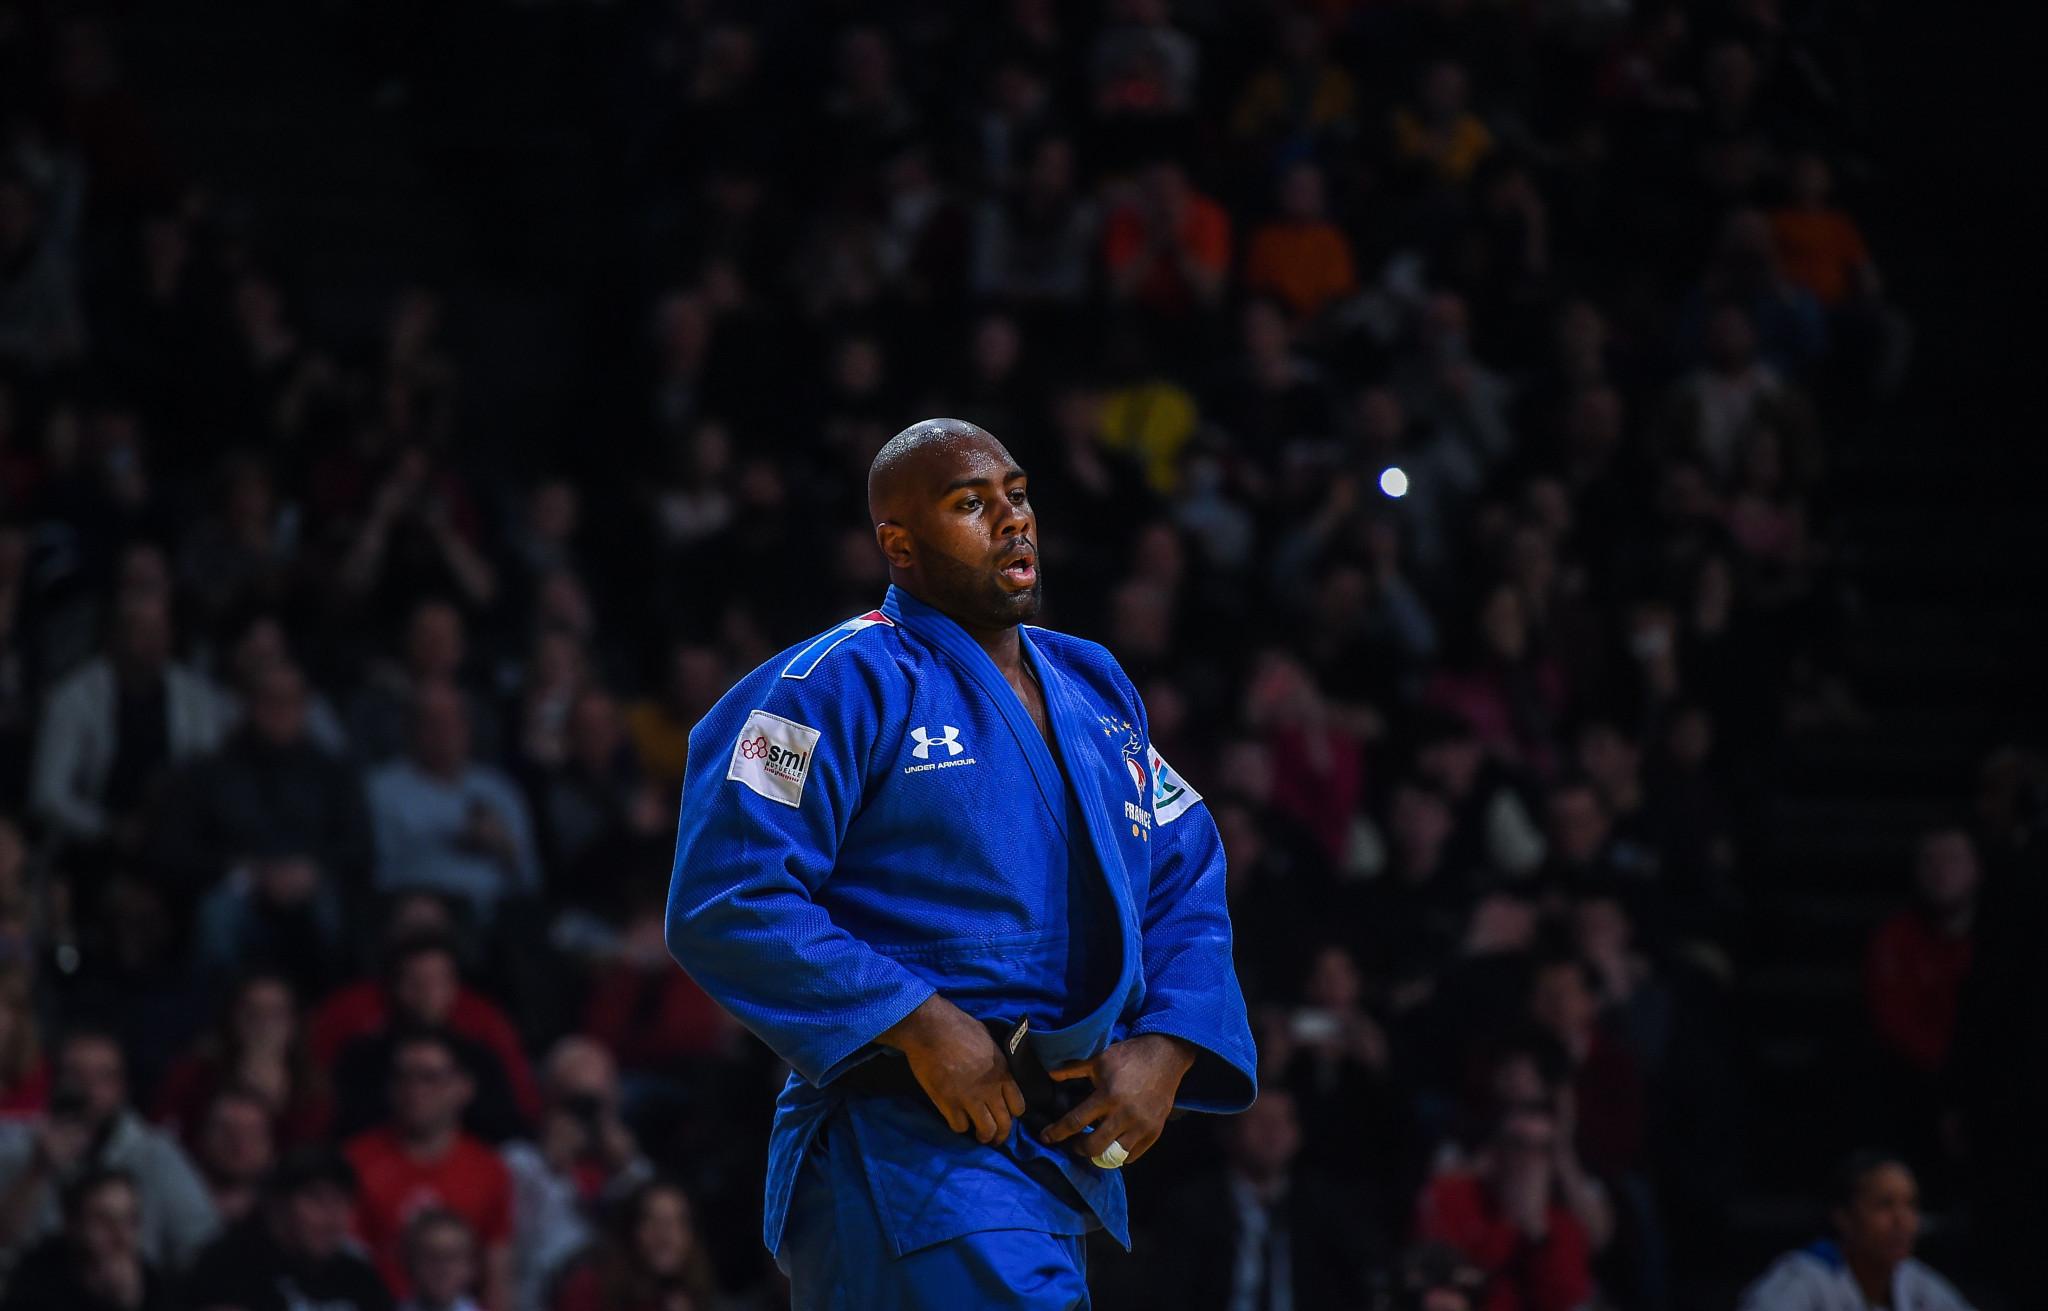 Judo's Rabat Grand Prix cancelled in bid to curb coronavirus spread